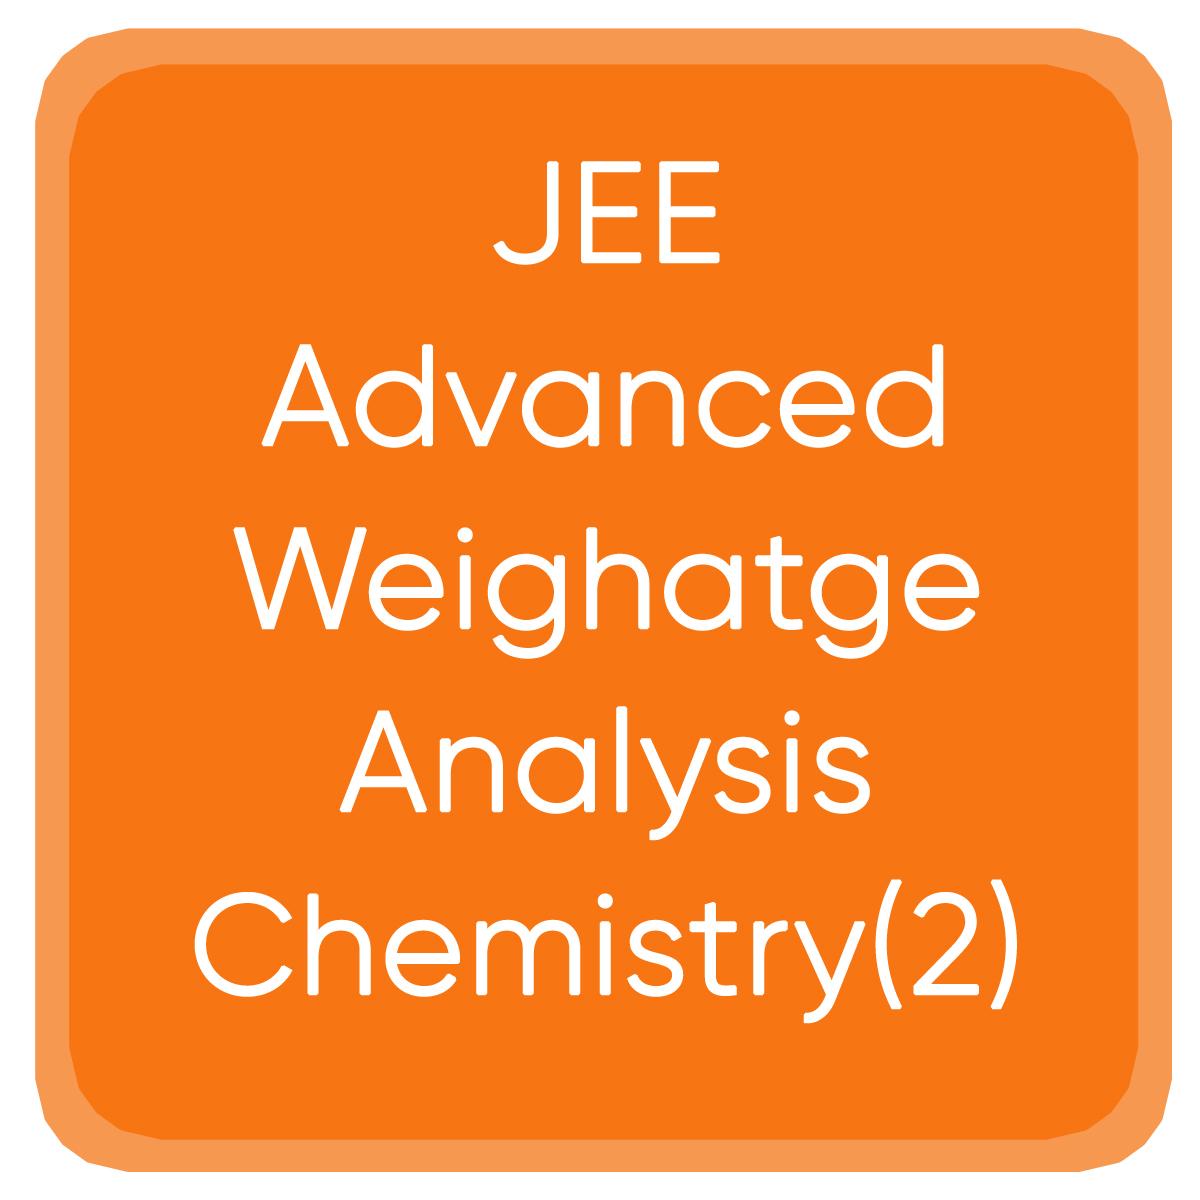 JEE Advanced Weighatge Analysis Chemistry(2)